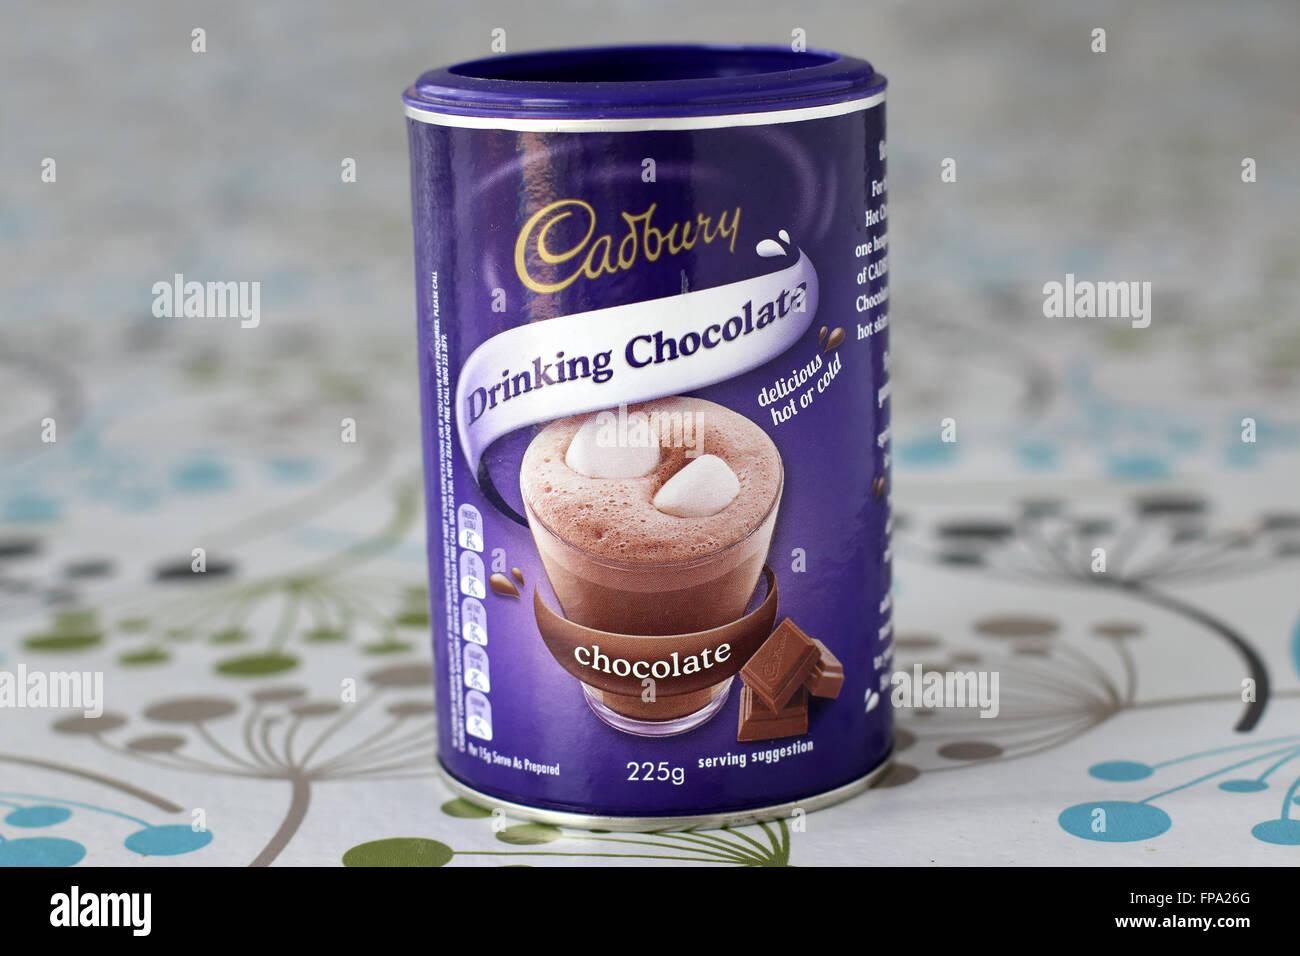 Cadbury Drinking Chocolate Stock Photo, Royalty Free Image ...